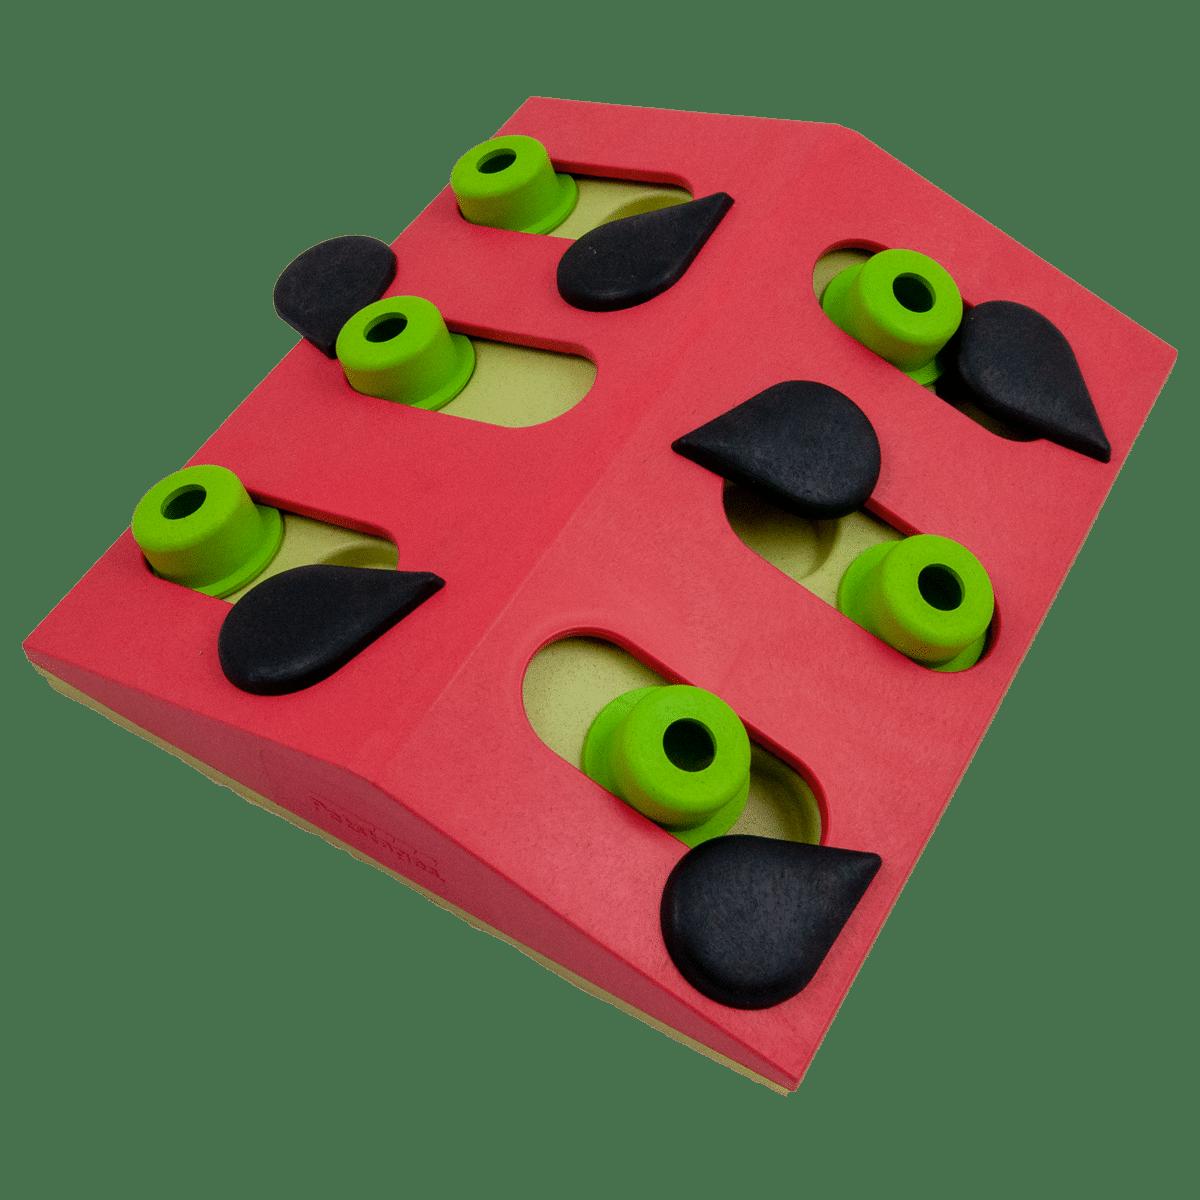 Melon Madness Puzzle aktiverar katten